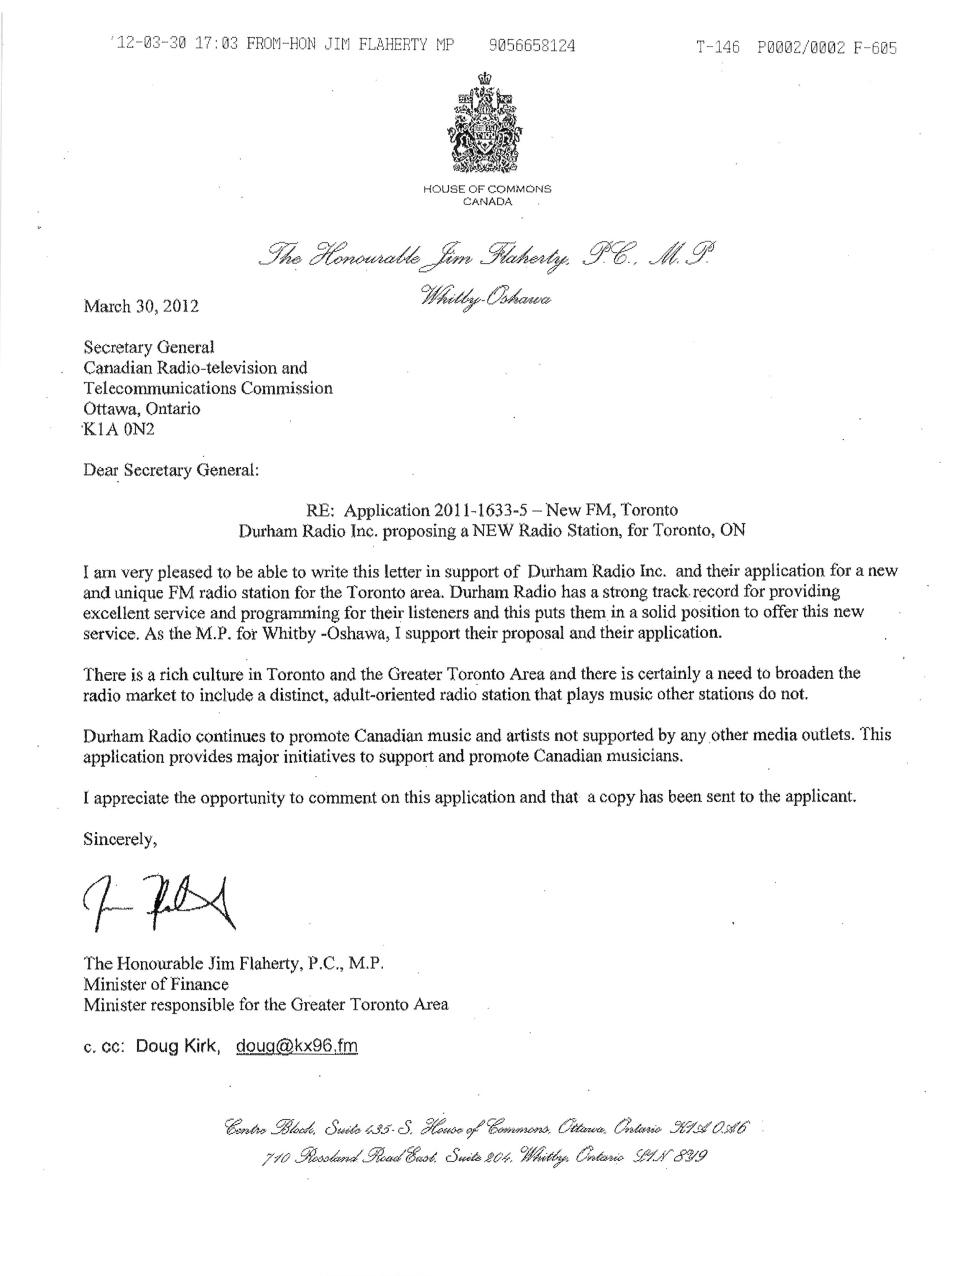 Resignation Letter Sample Ontario – Resignation Letter Canada